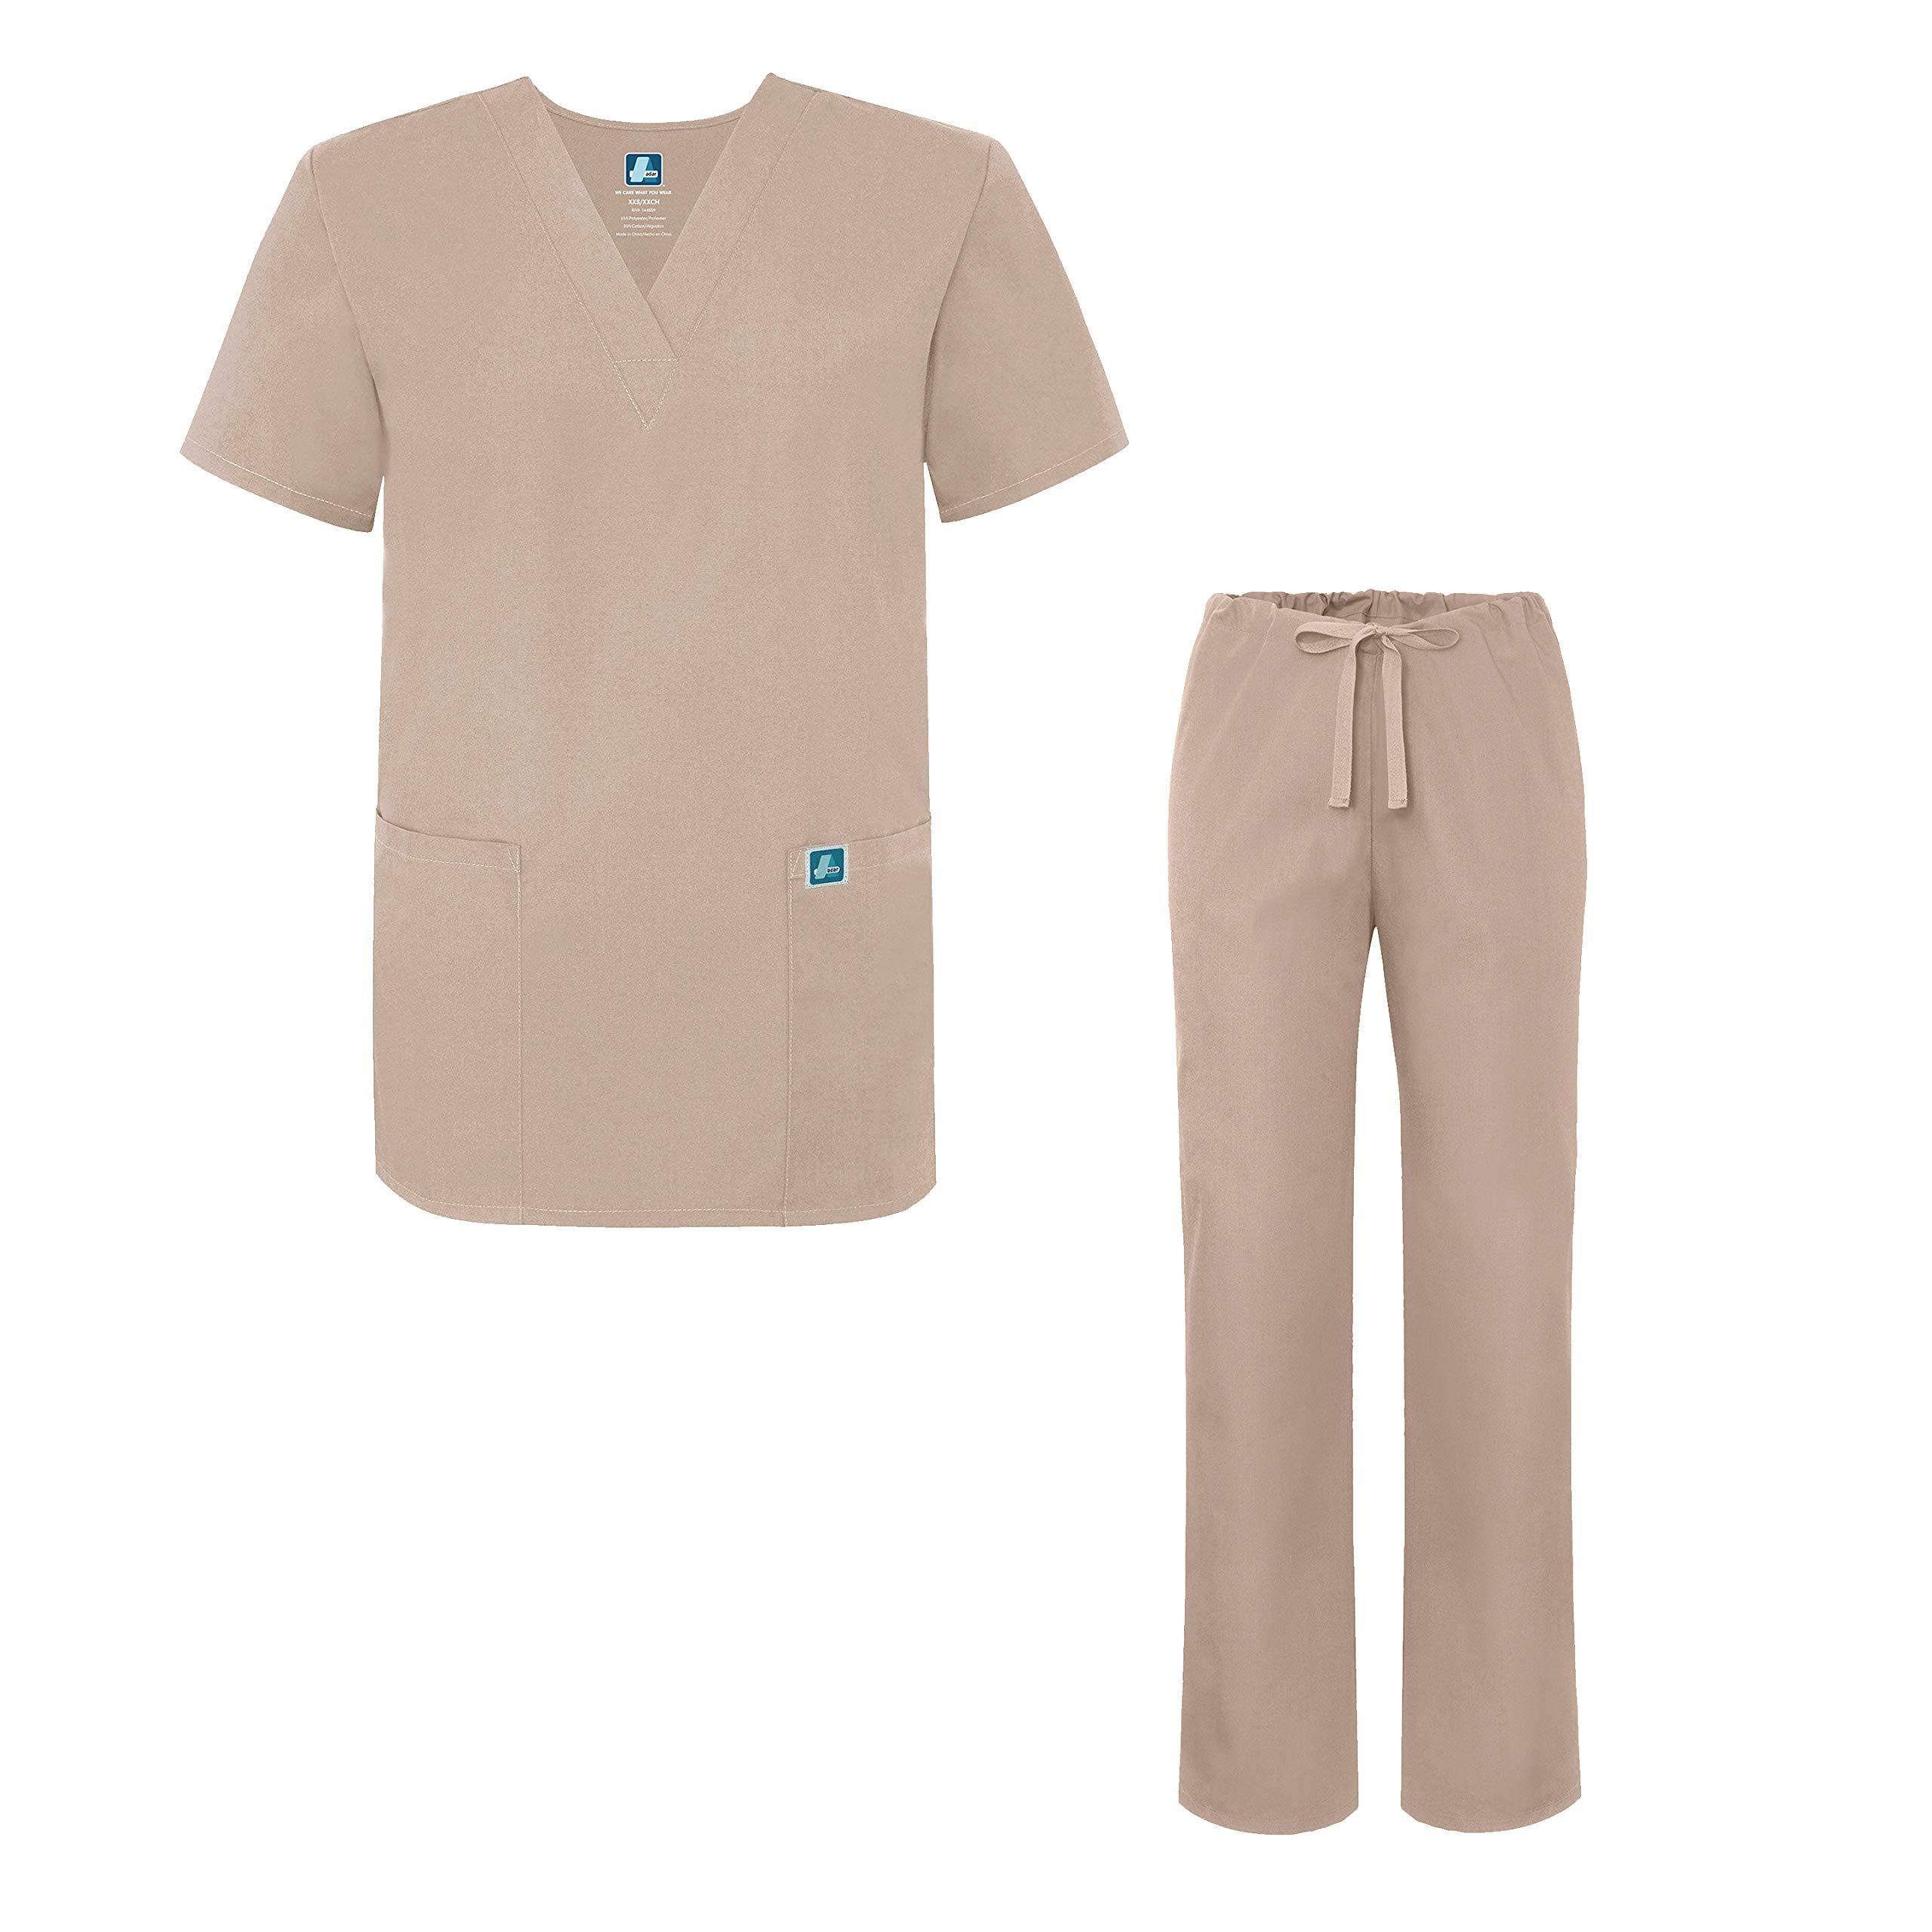 57219c3b581 Galleon - Adar Universal Medical Scrubs Set Medical Uniforms - Unisex Fit -  701 - KKI - S Khaki